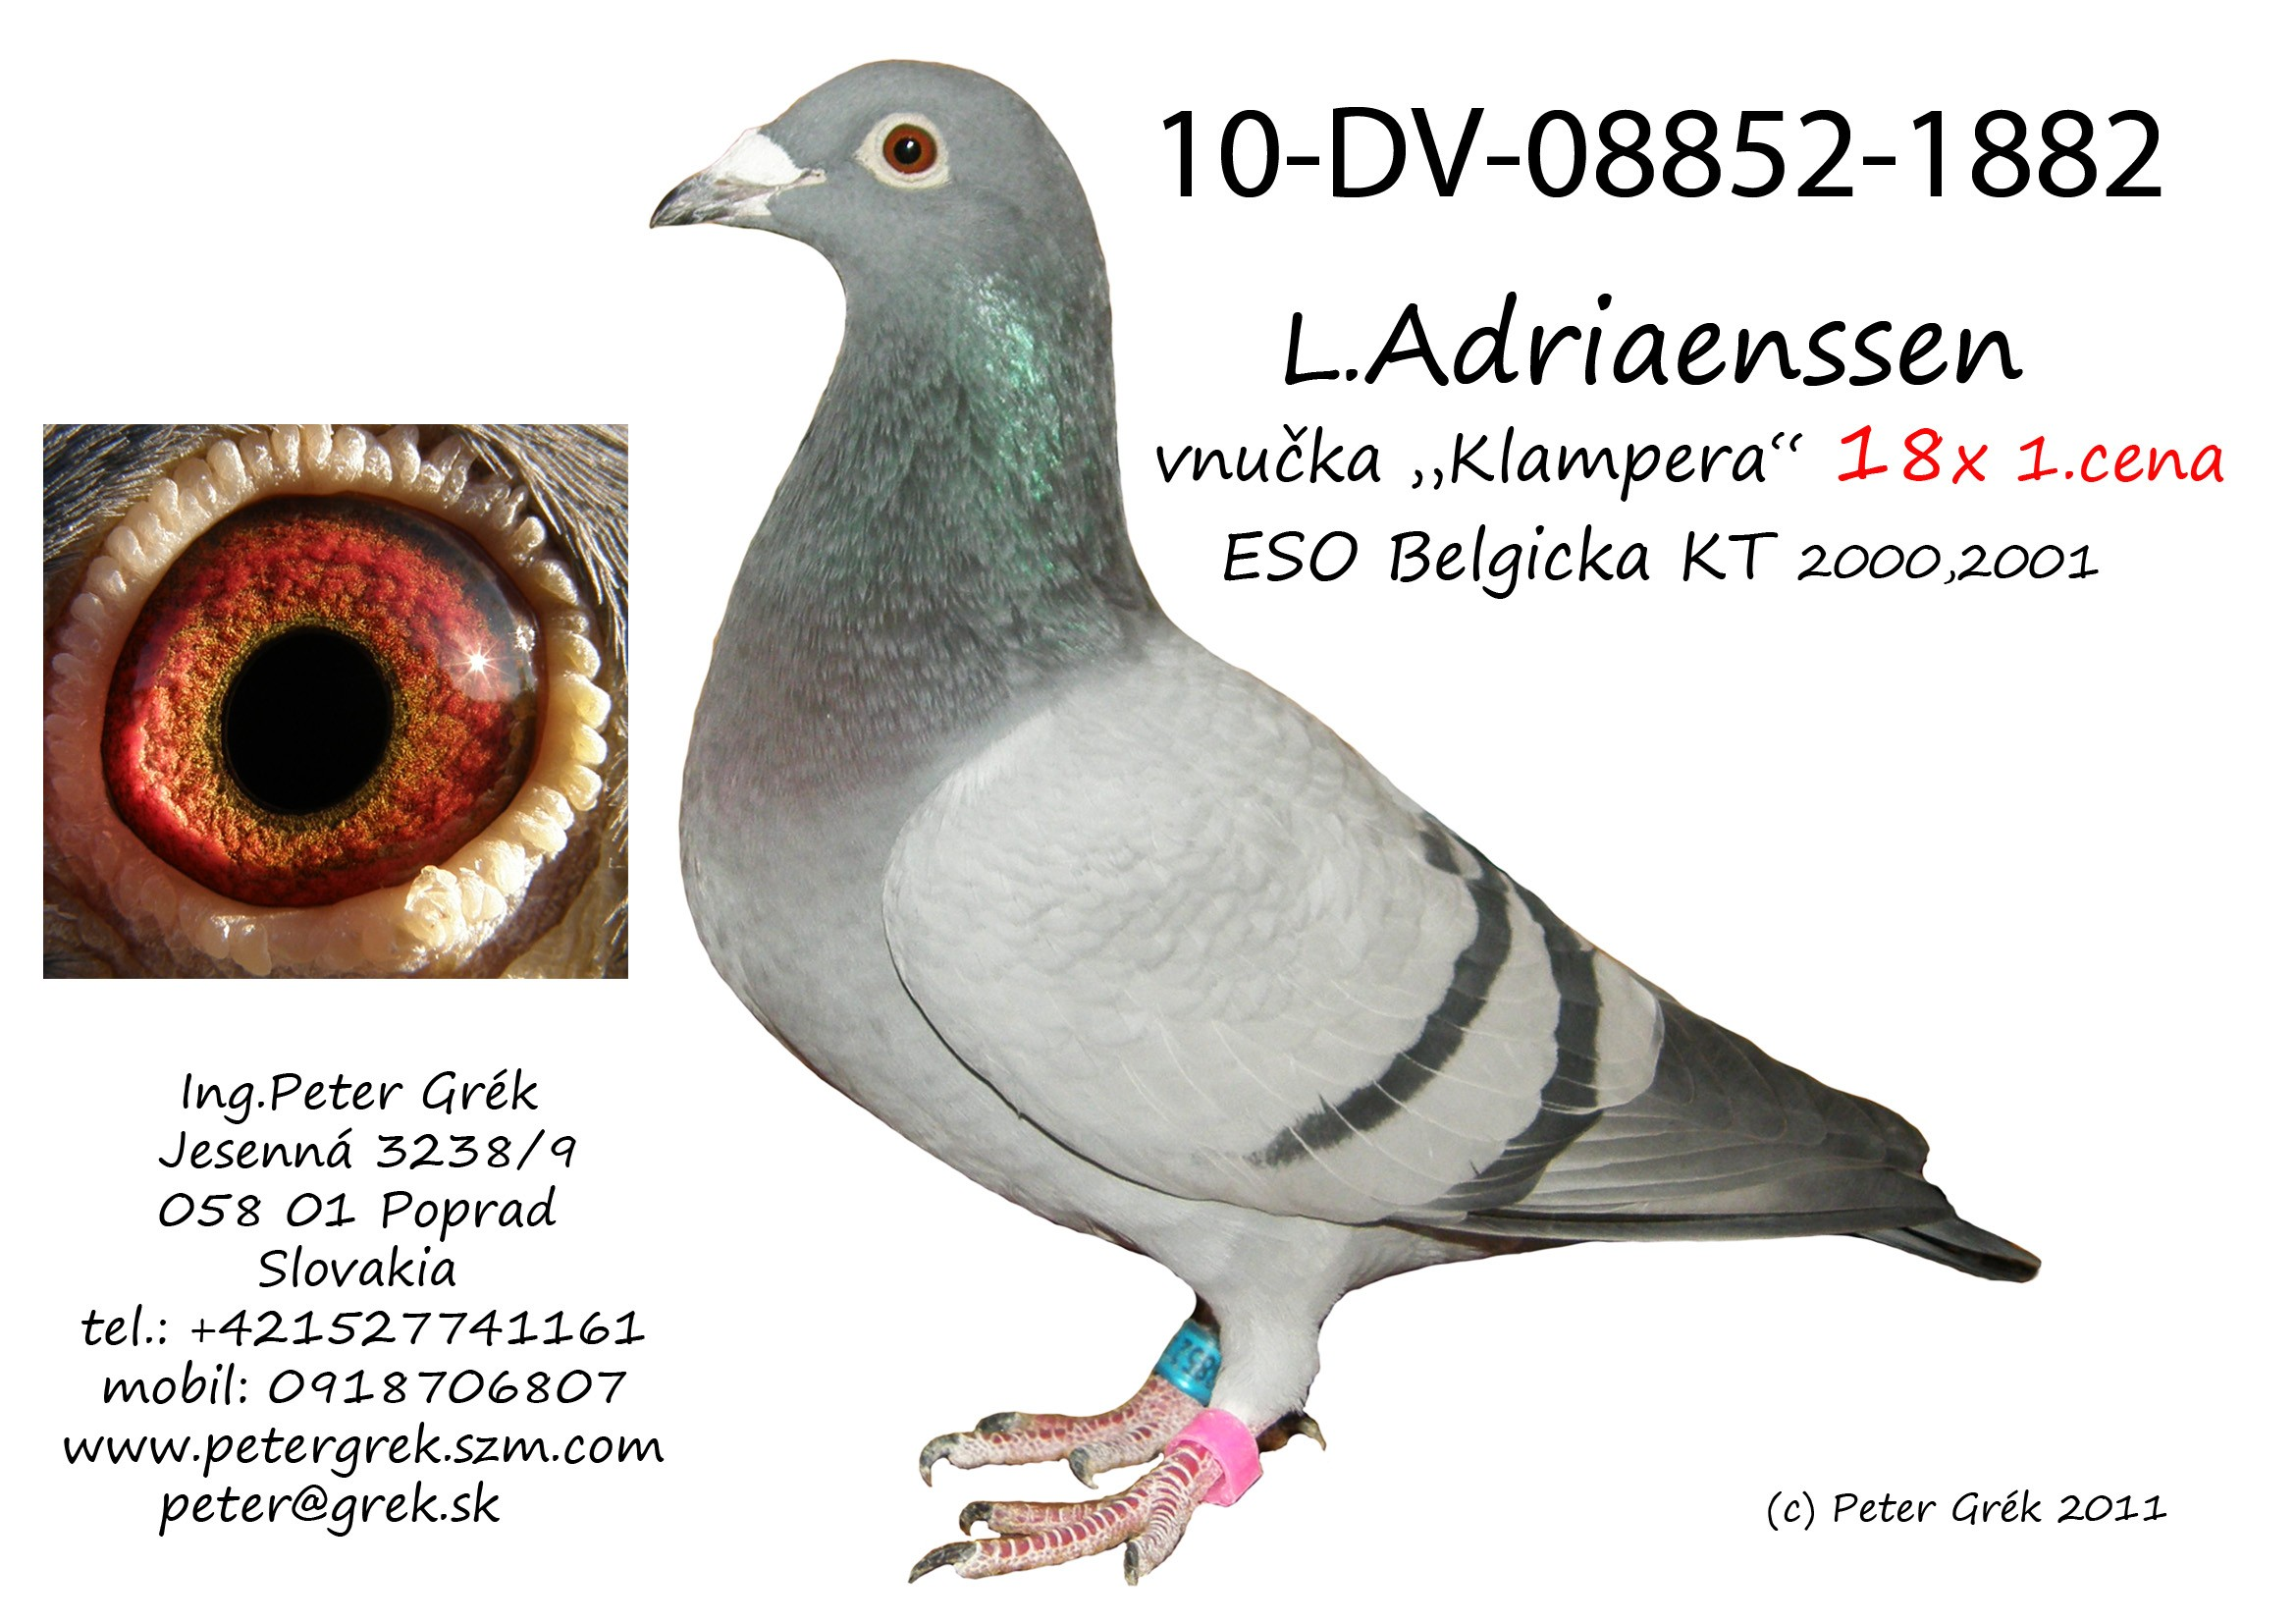 DV-2010-08852-1882